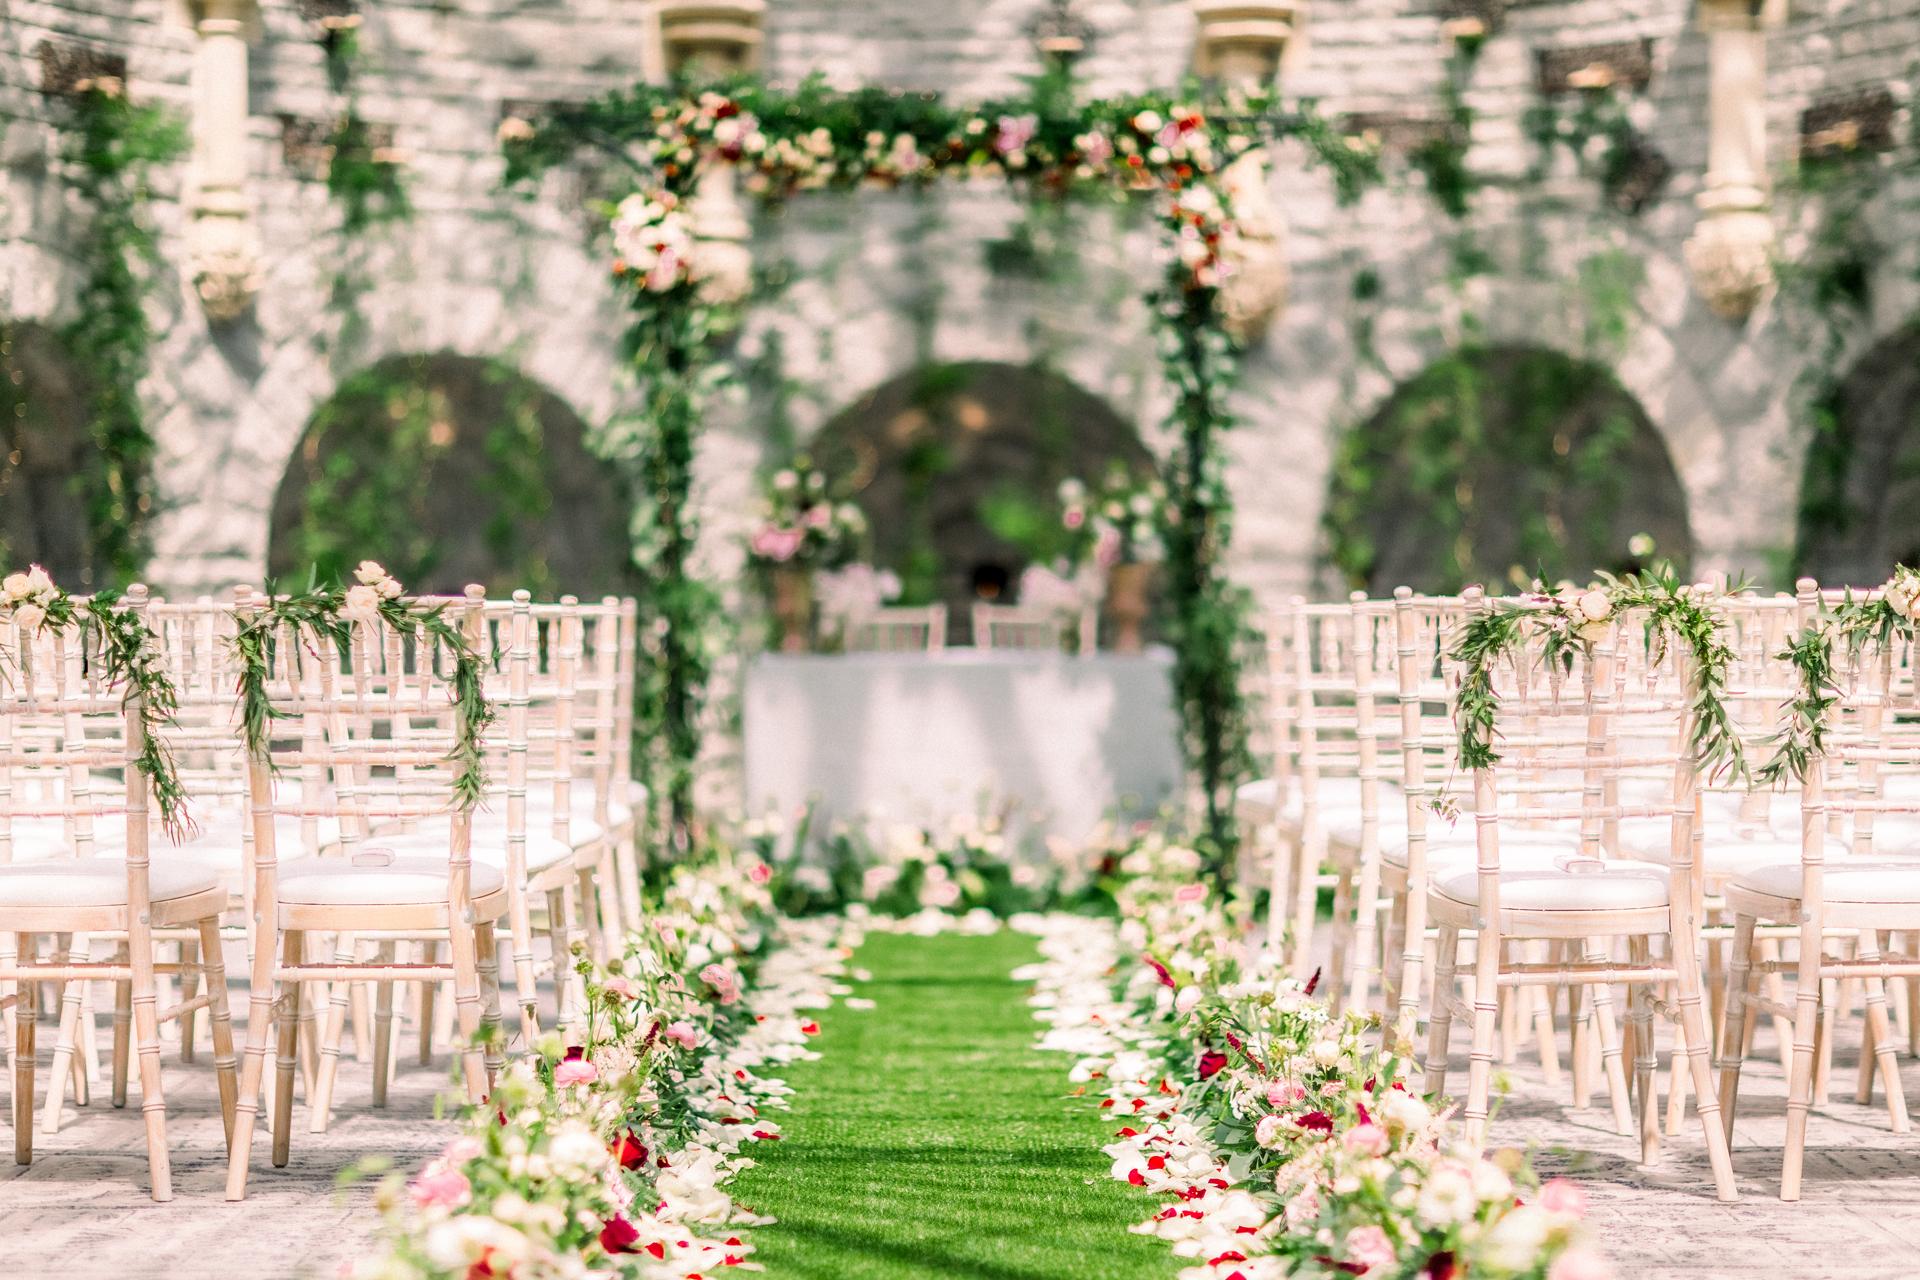 www.charlottemunro.co.uk | Charlotte Munro Wedding's essential wedding decor checklist for couples